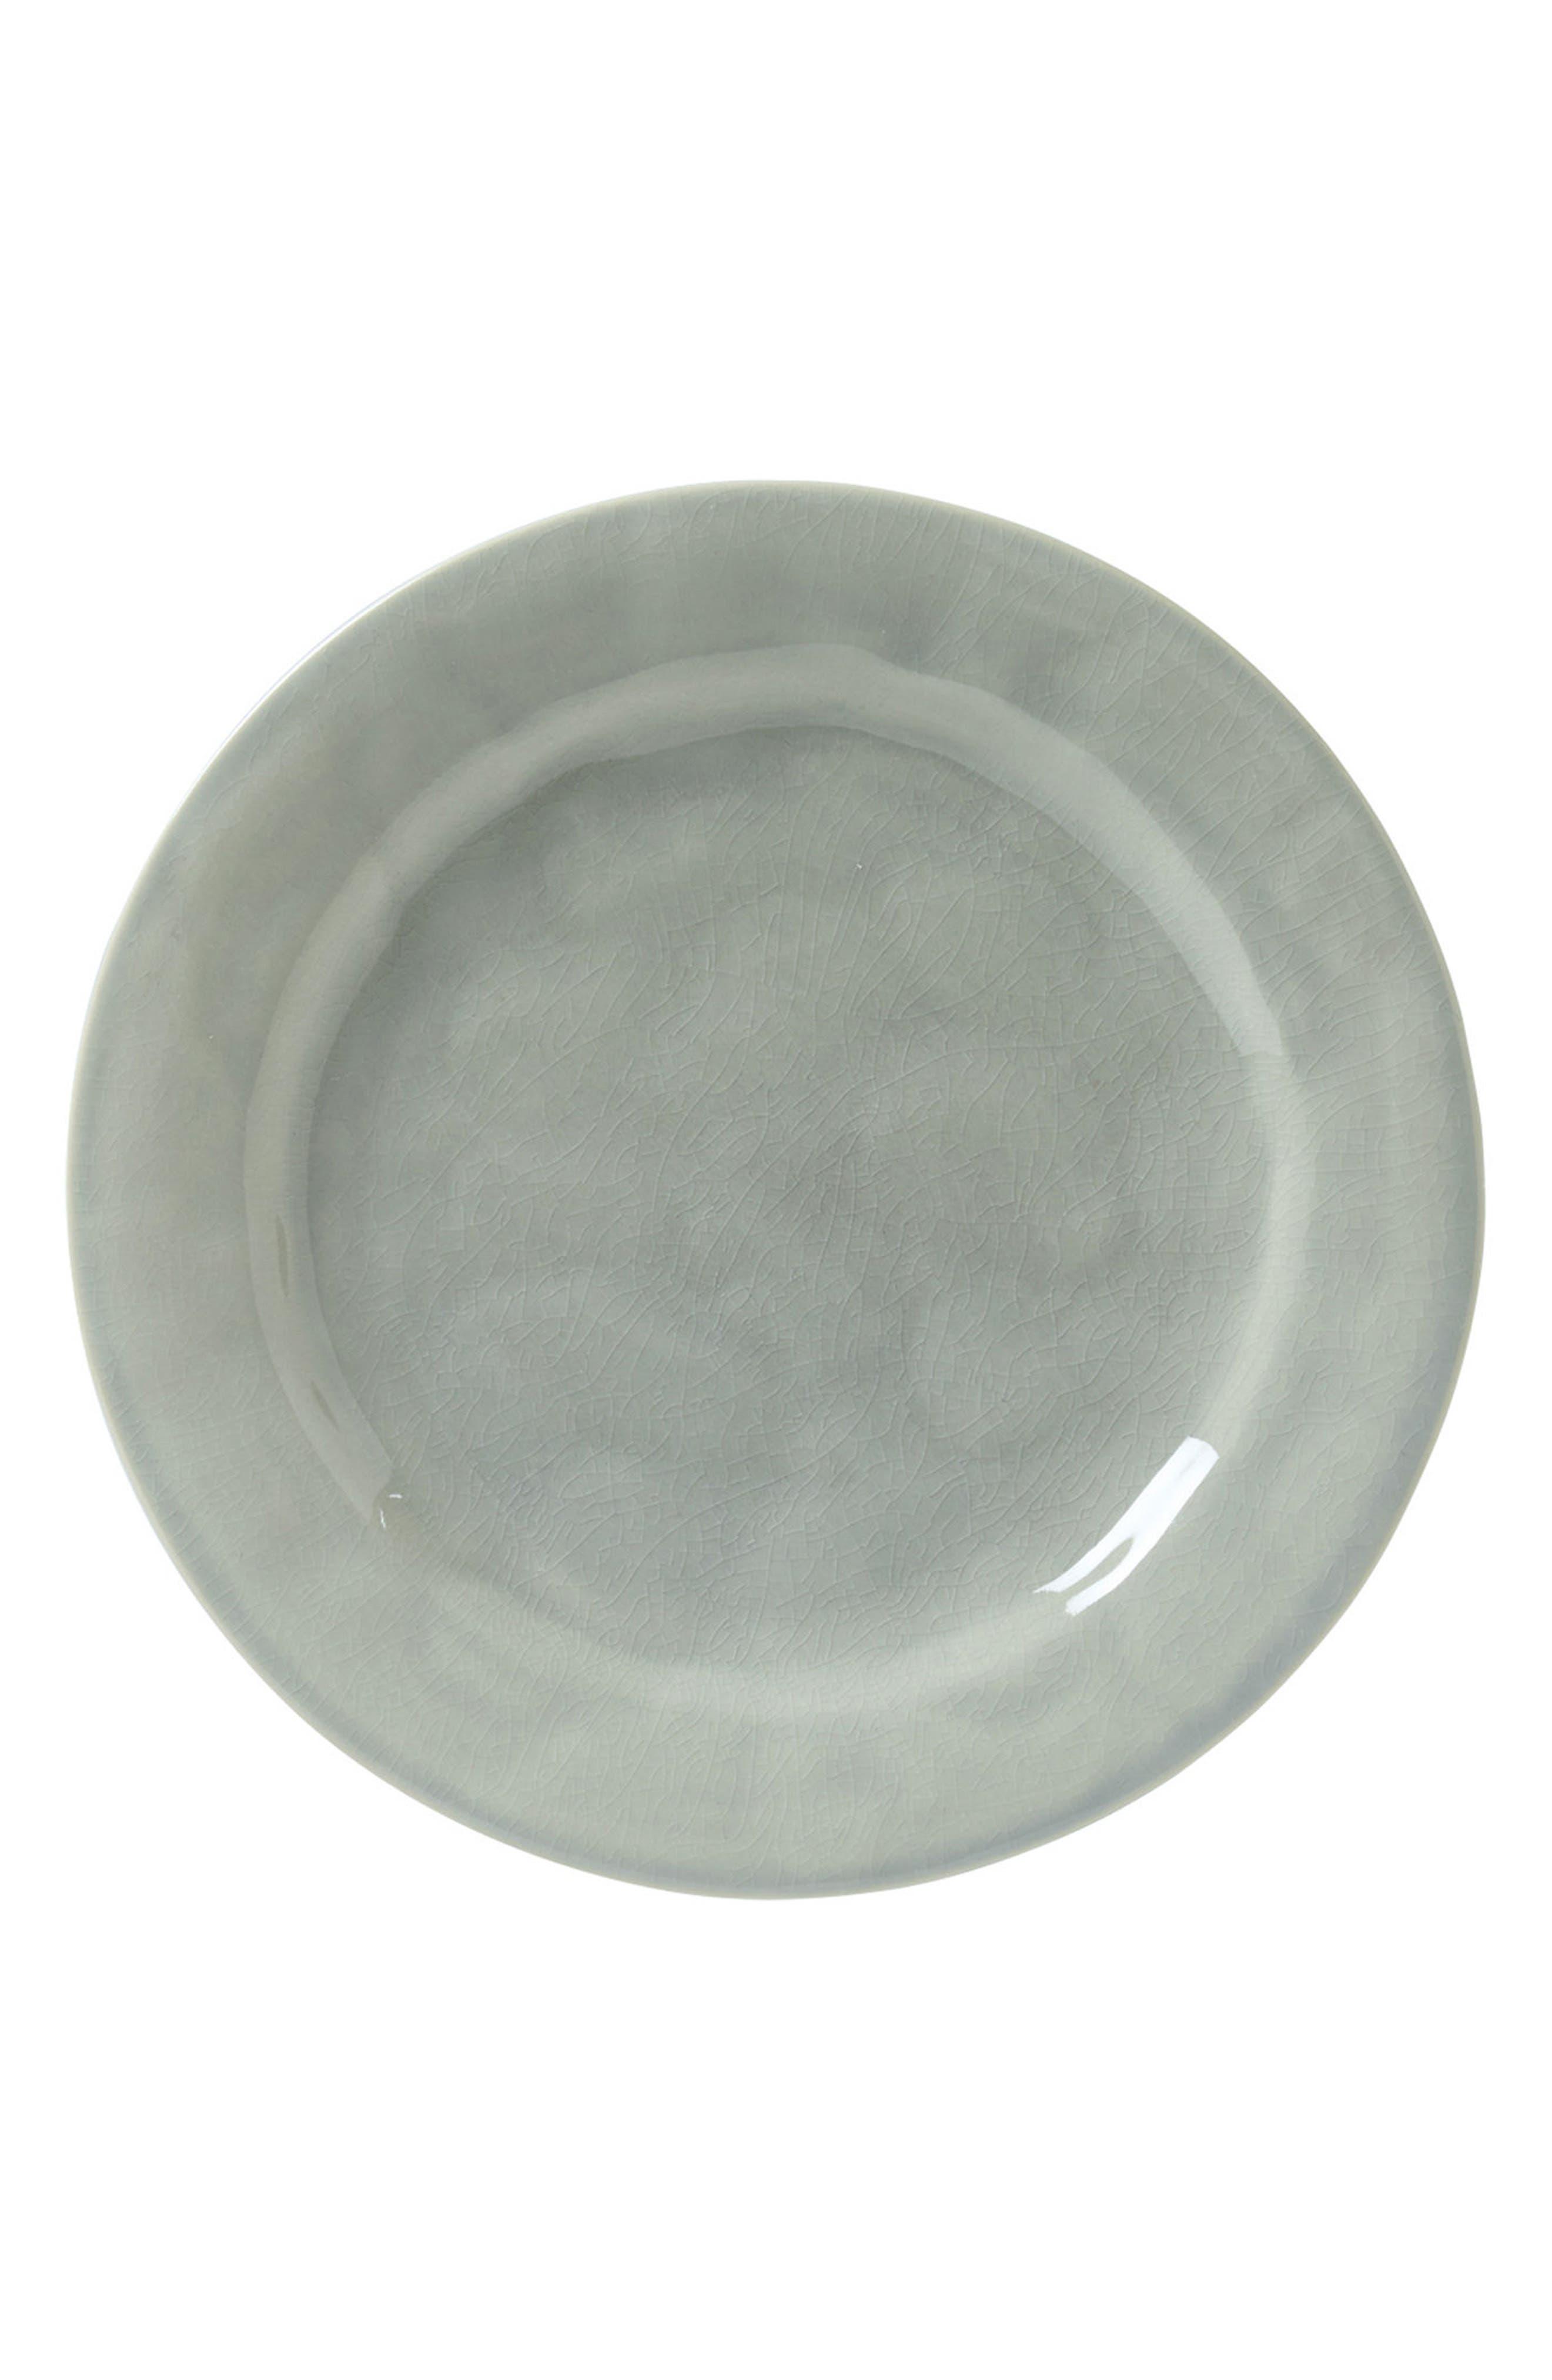 Juliska Puro Dessert Plate